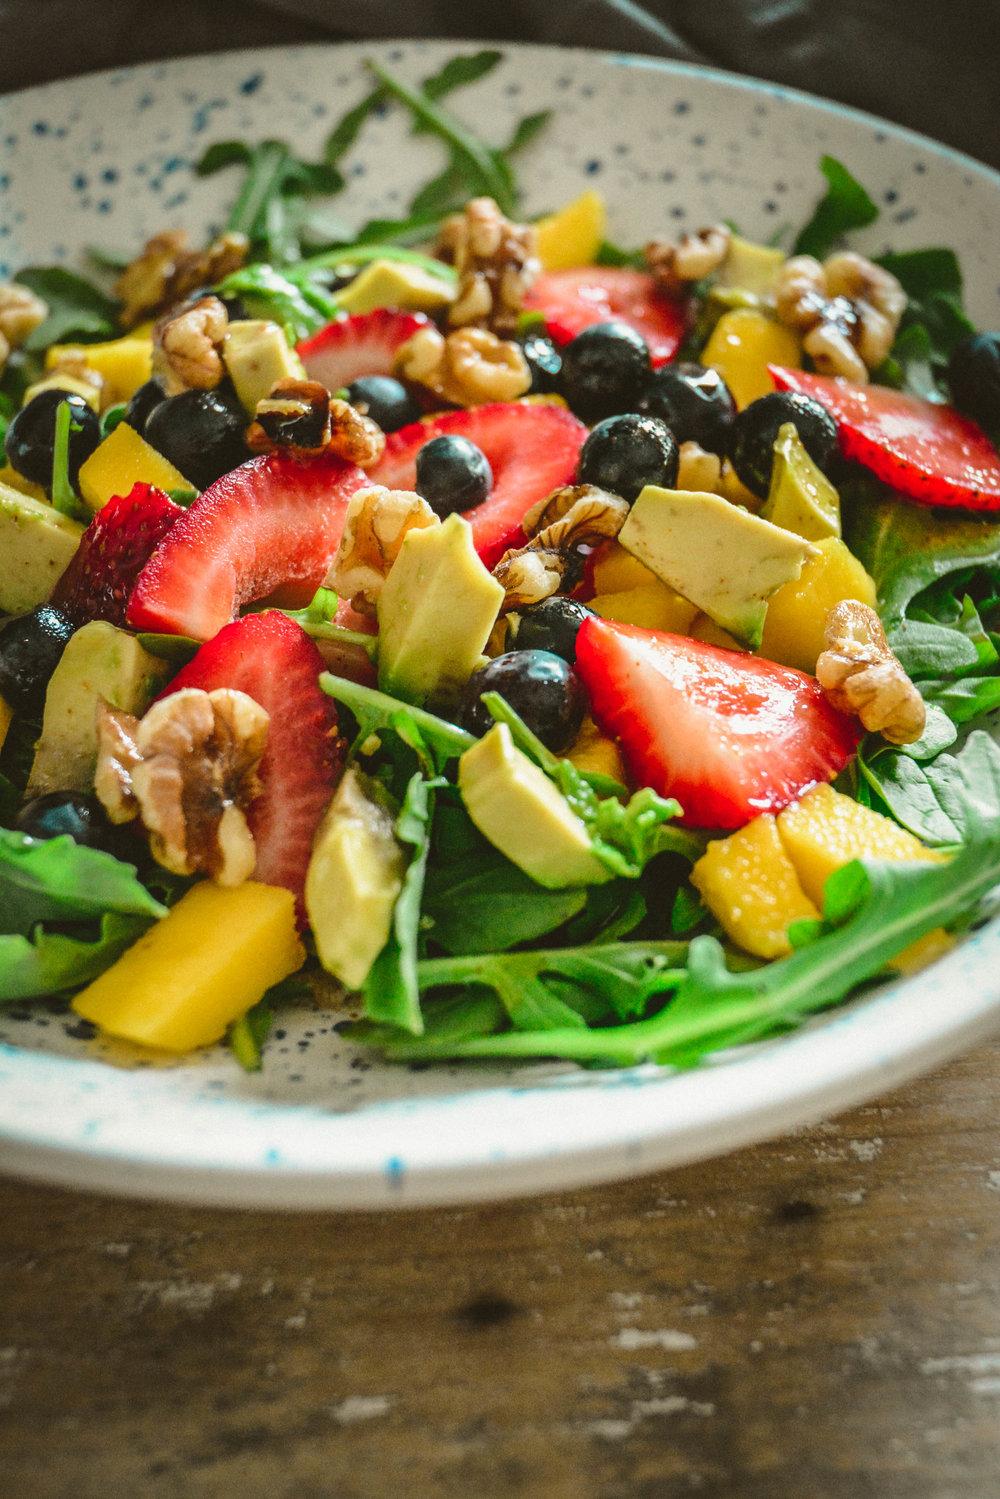 arugula and strawberry salad with cayenne lemon vinigrette